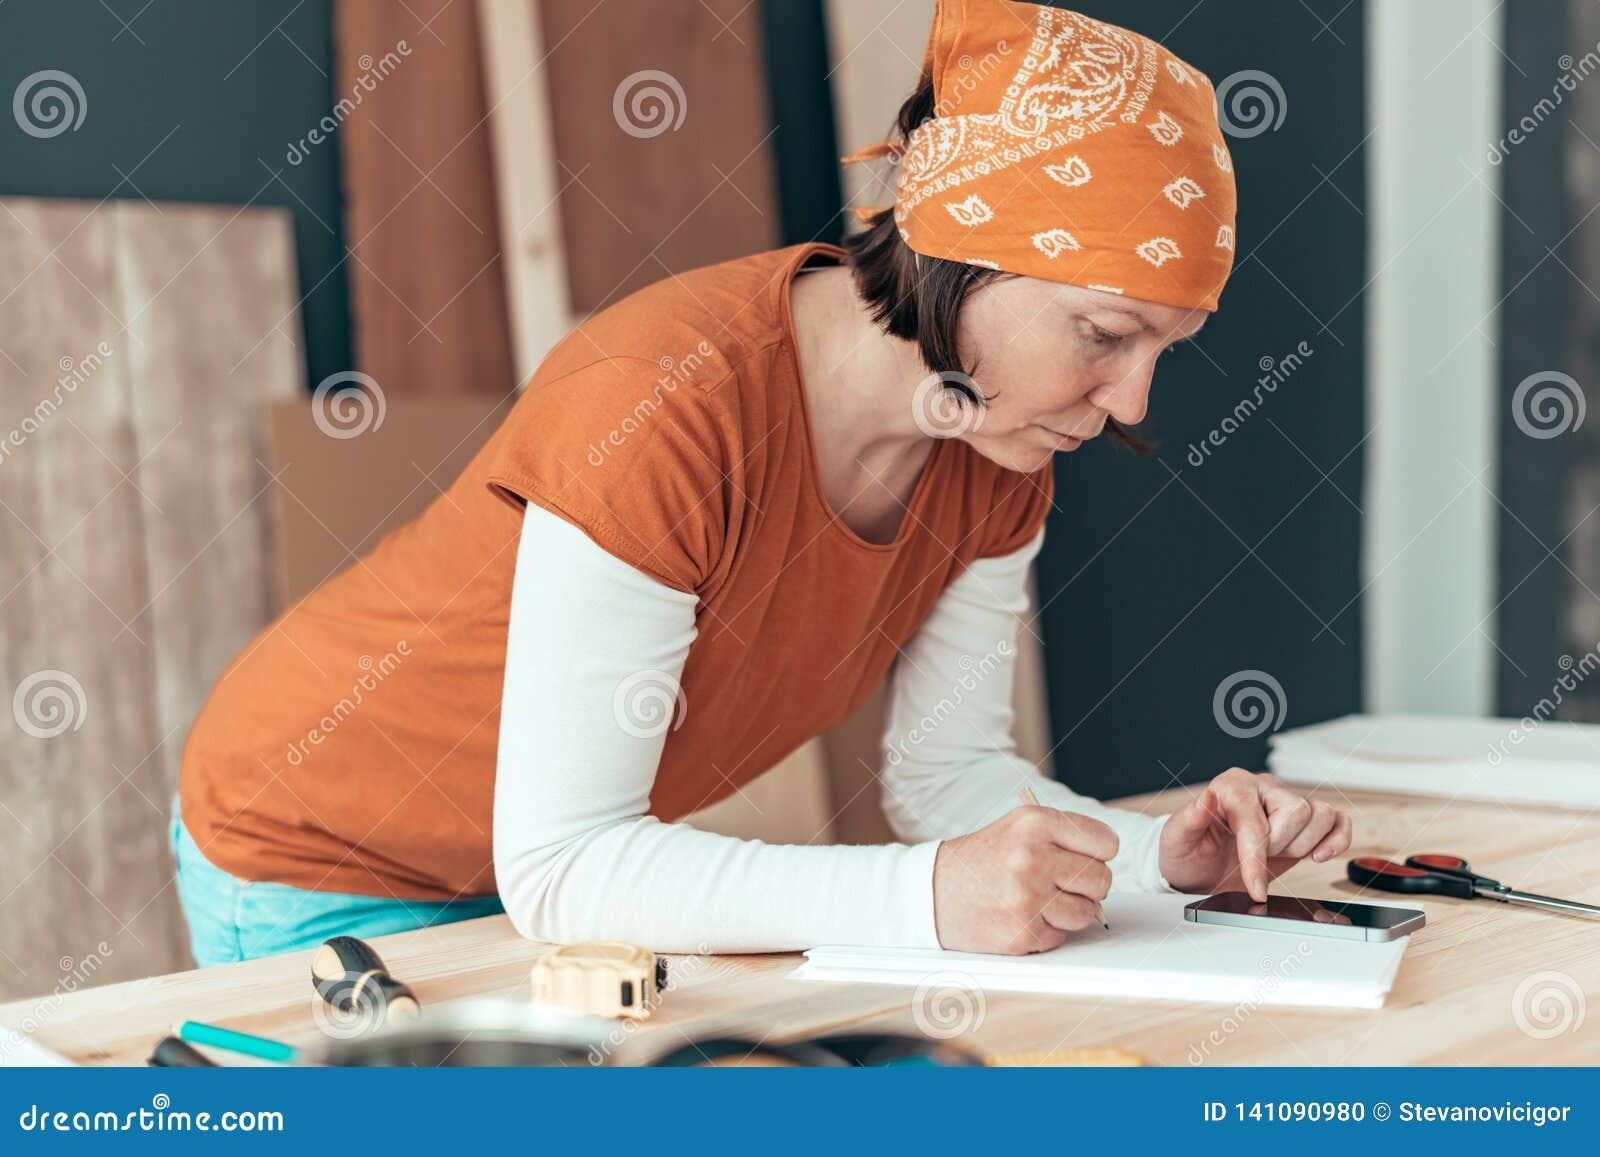 Female carpenter doing financial calculation